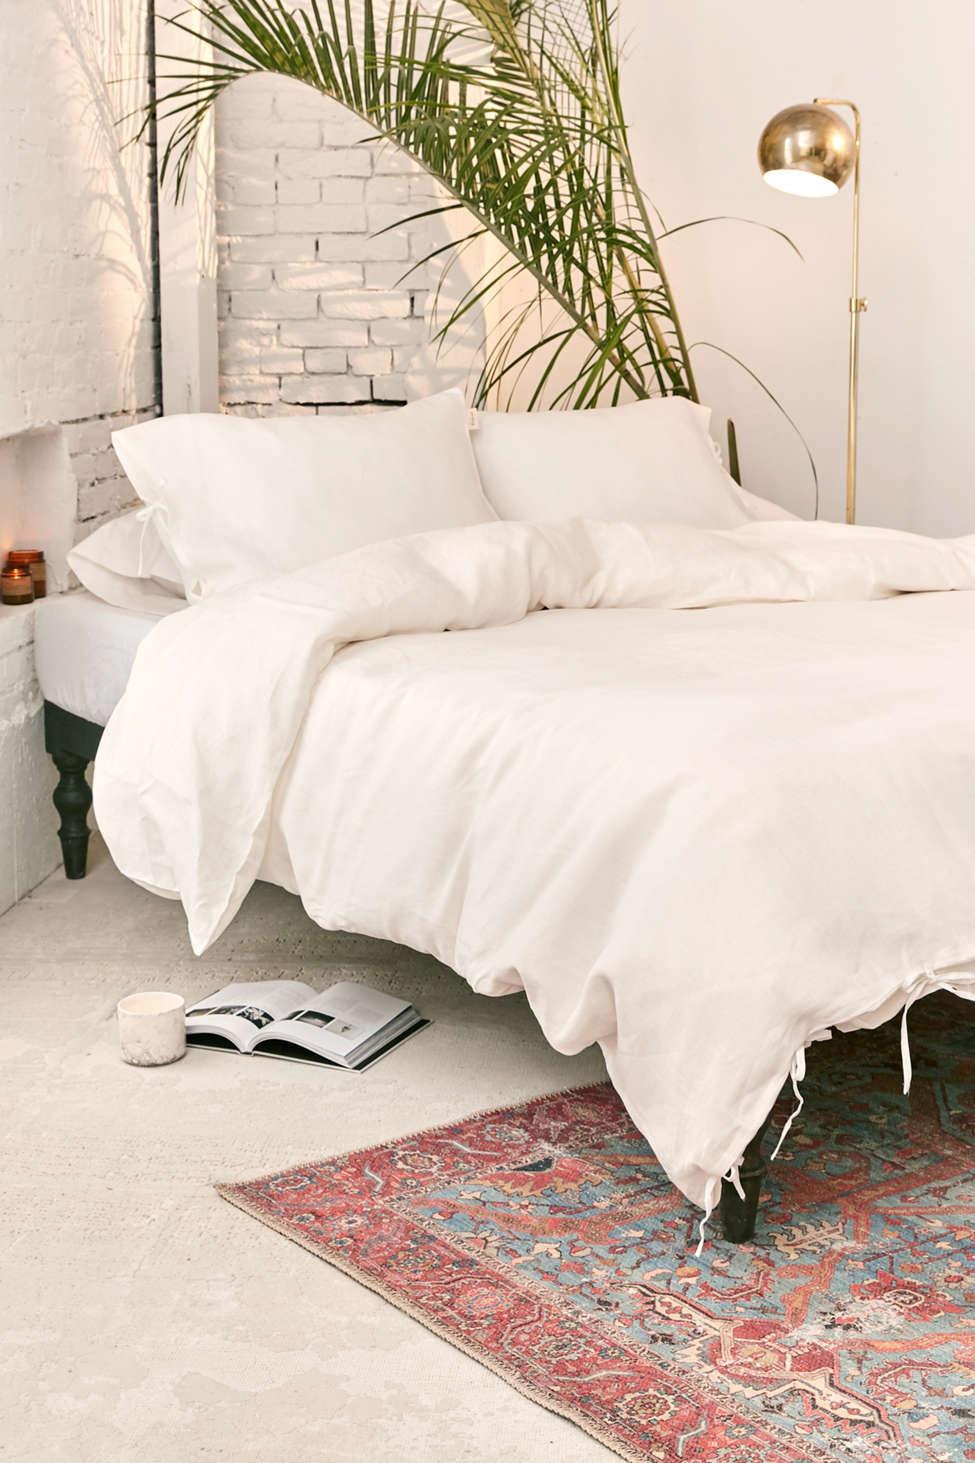 Slide View: 1: The Beach People Linen Duvet Cover + Pillowcase Set